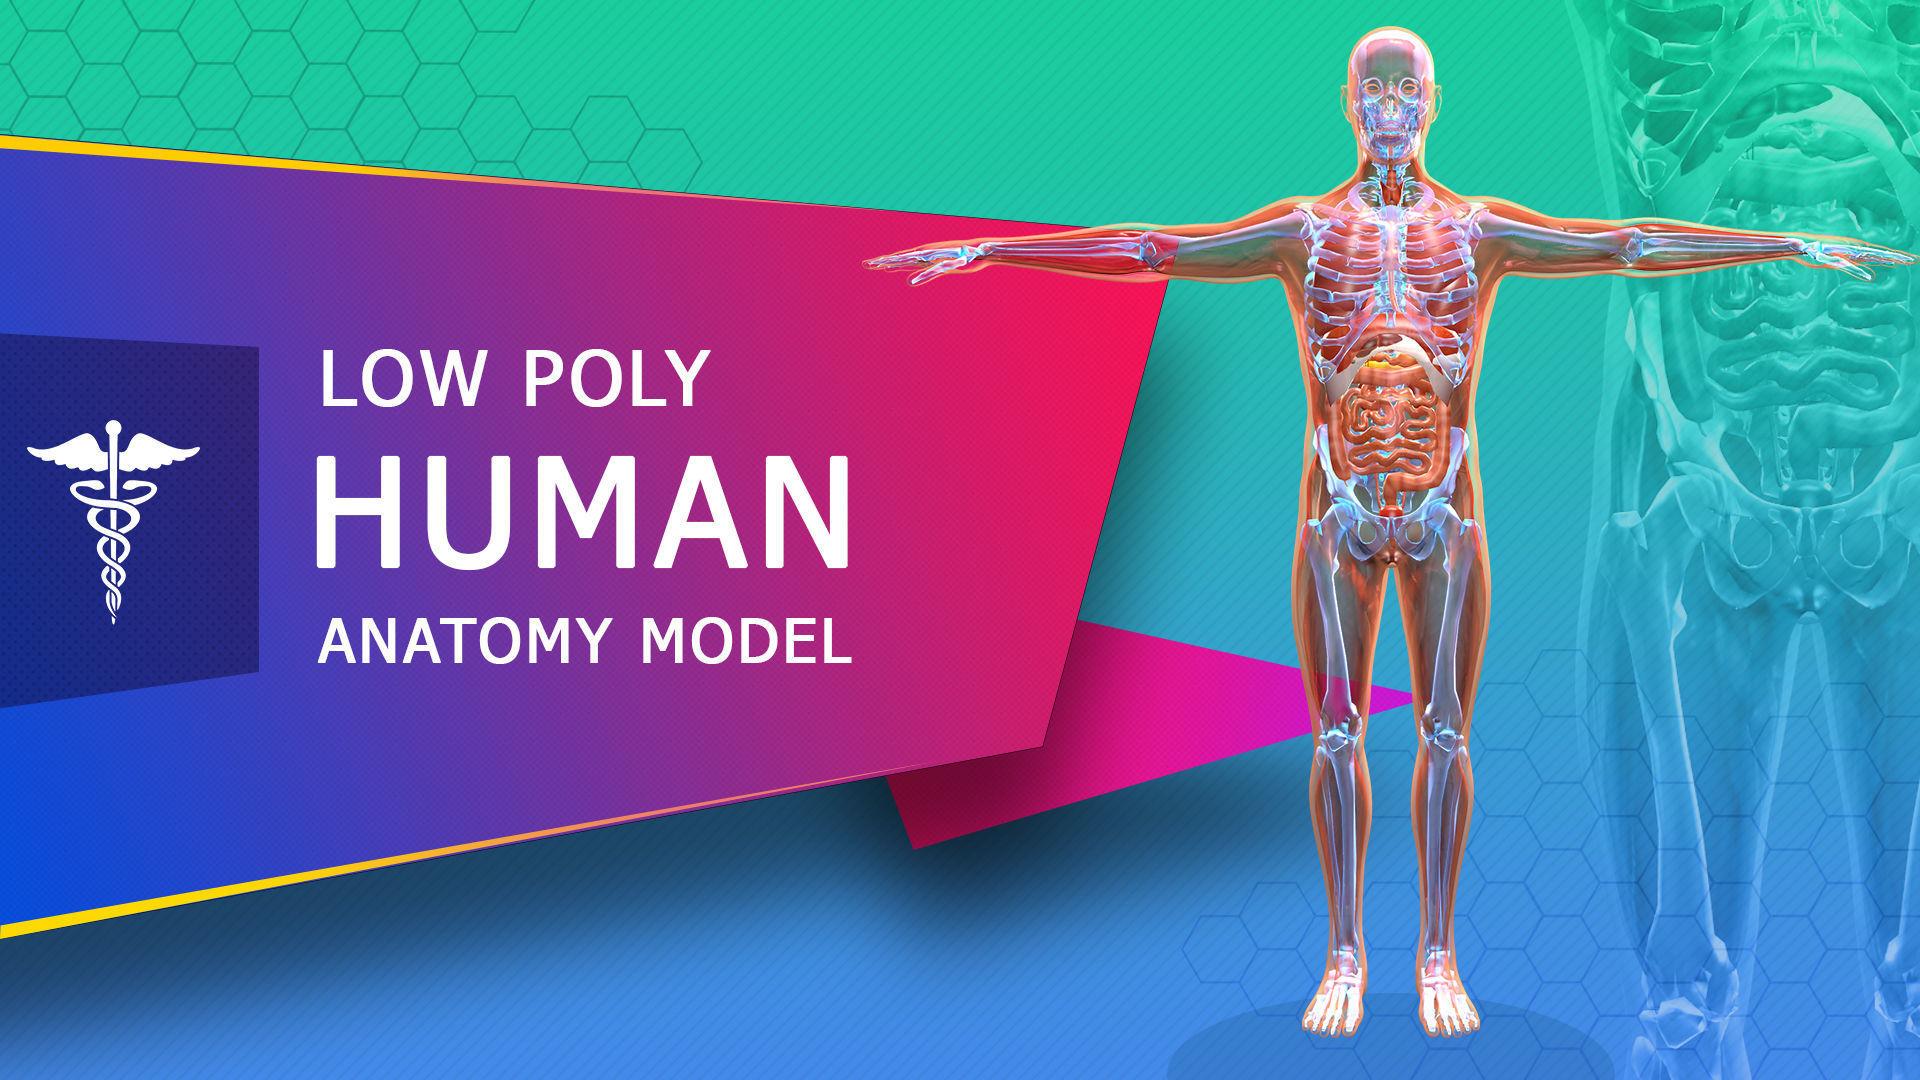 Low poly Human Anatomy Model